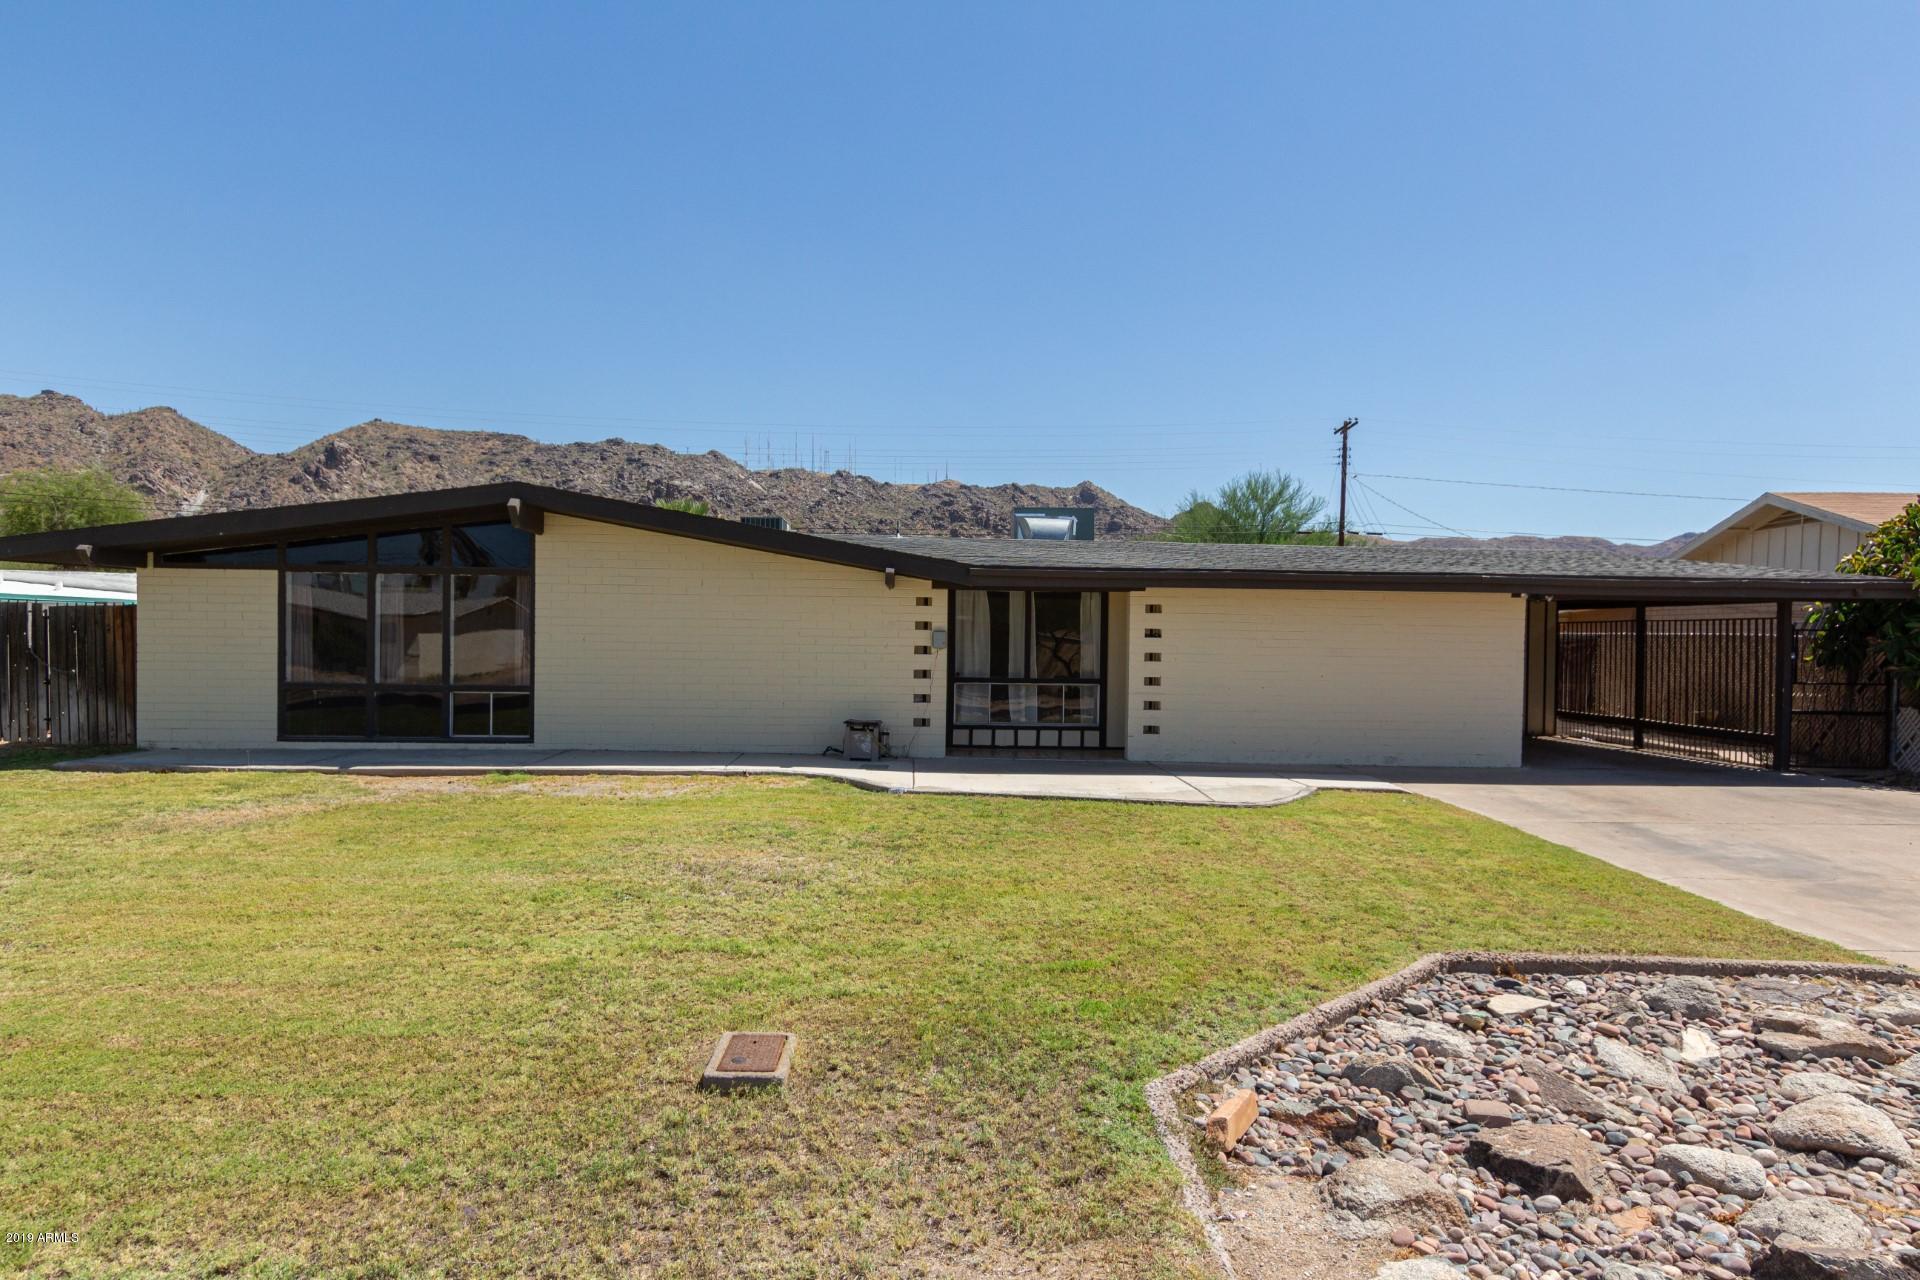 Photo for 327 E Monte Way, Phoenix, AZ 85042 (MLS # 5964898)